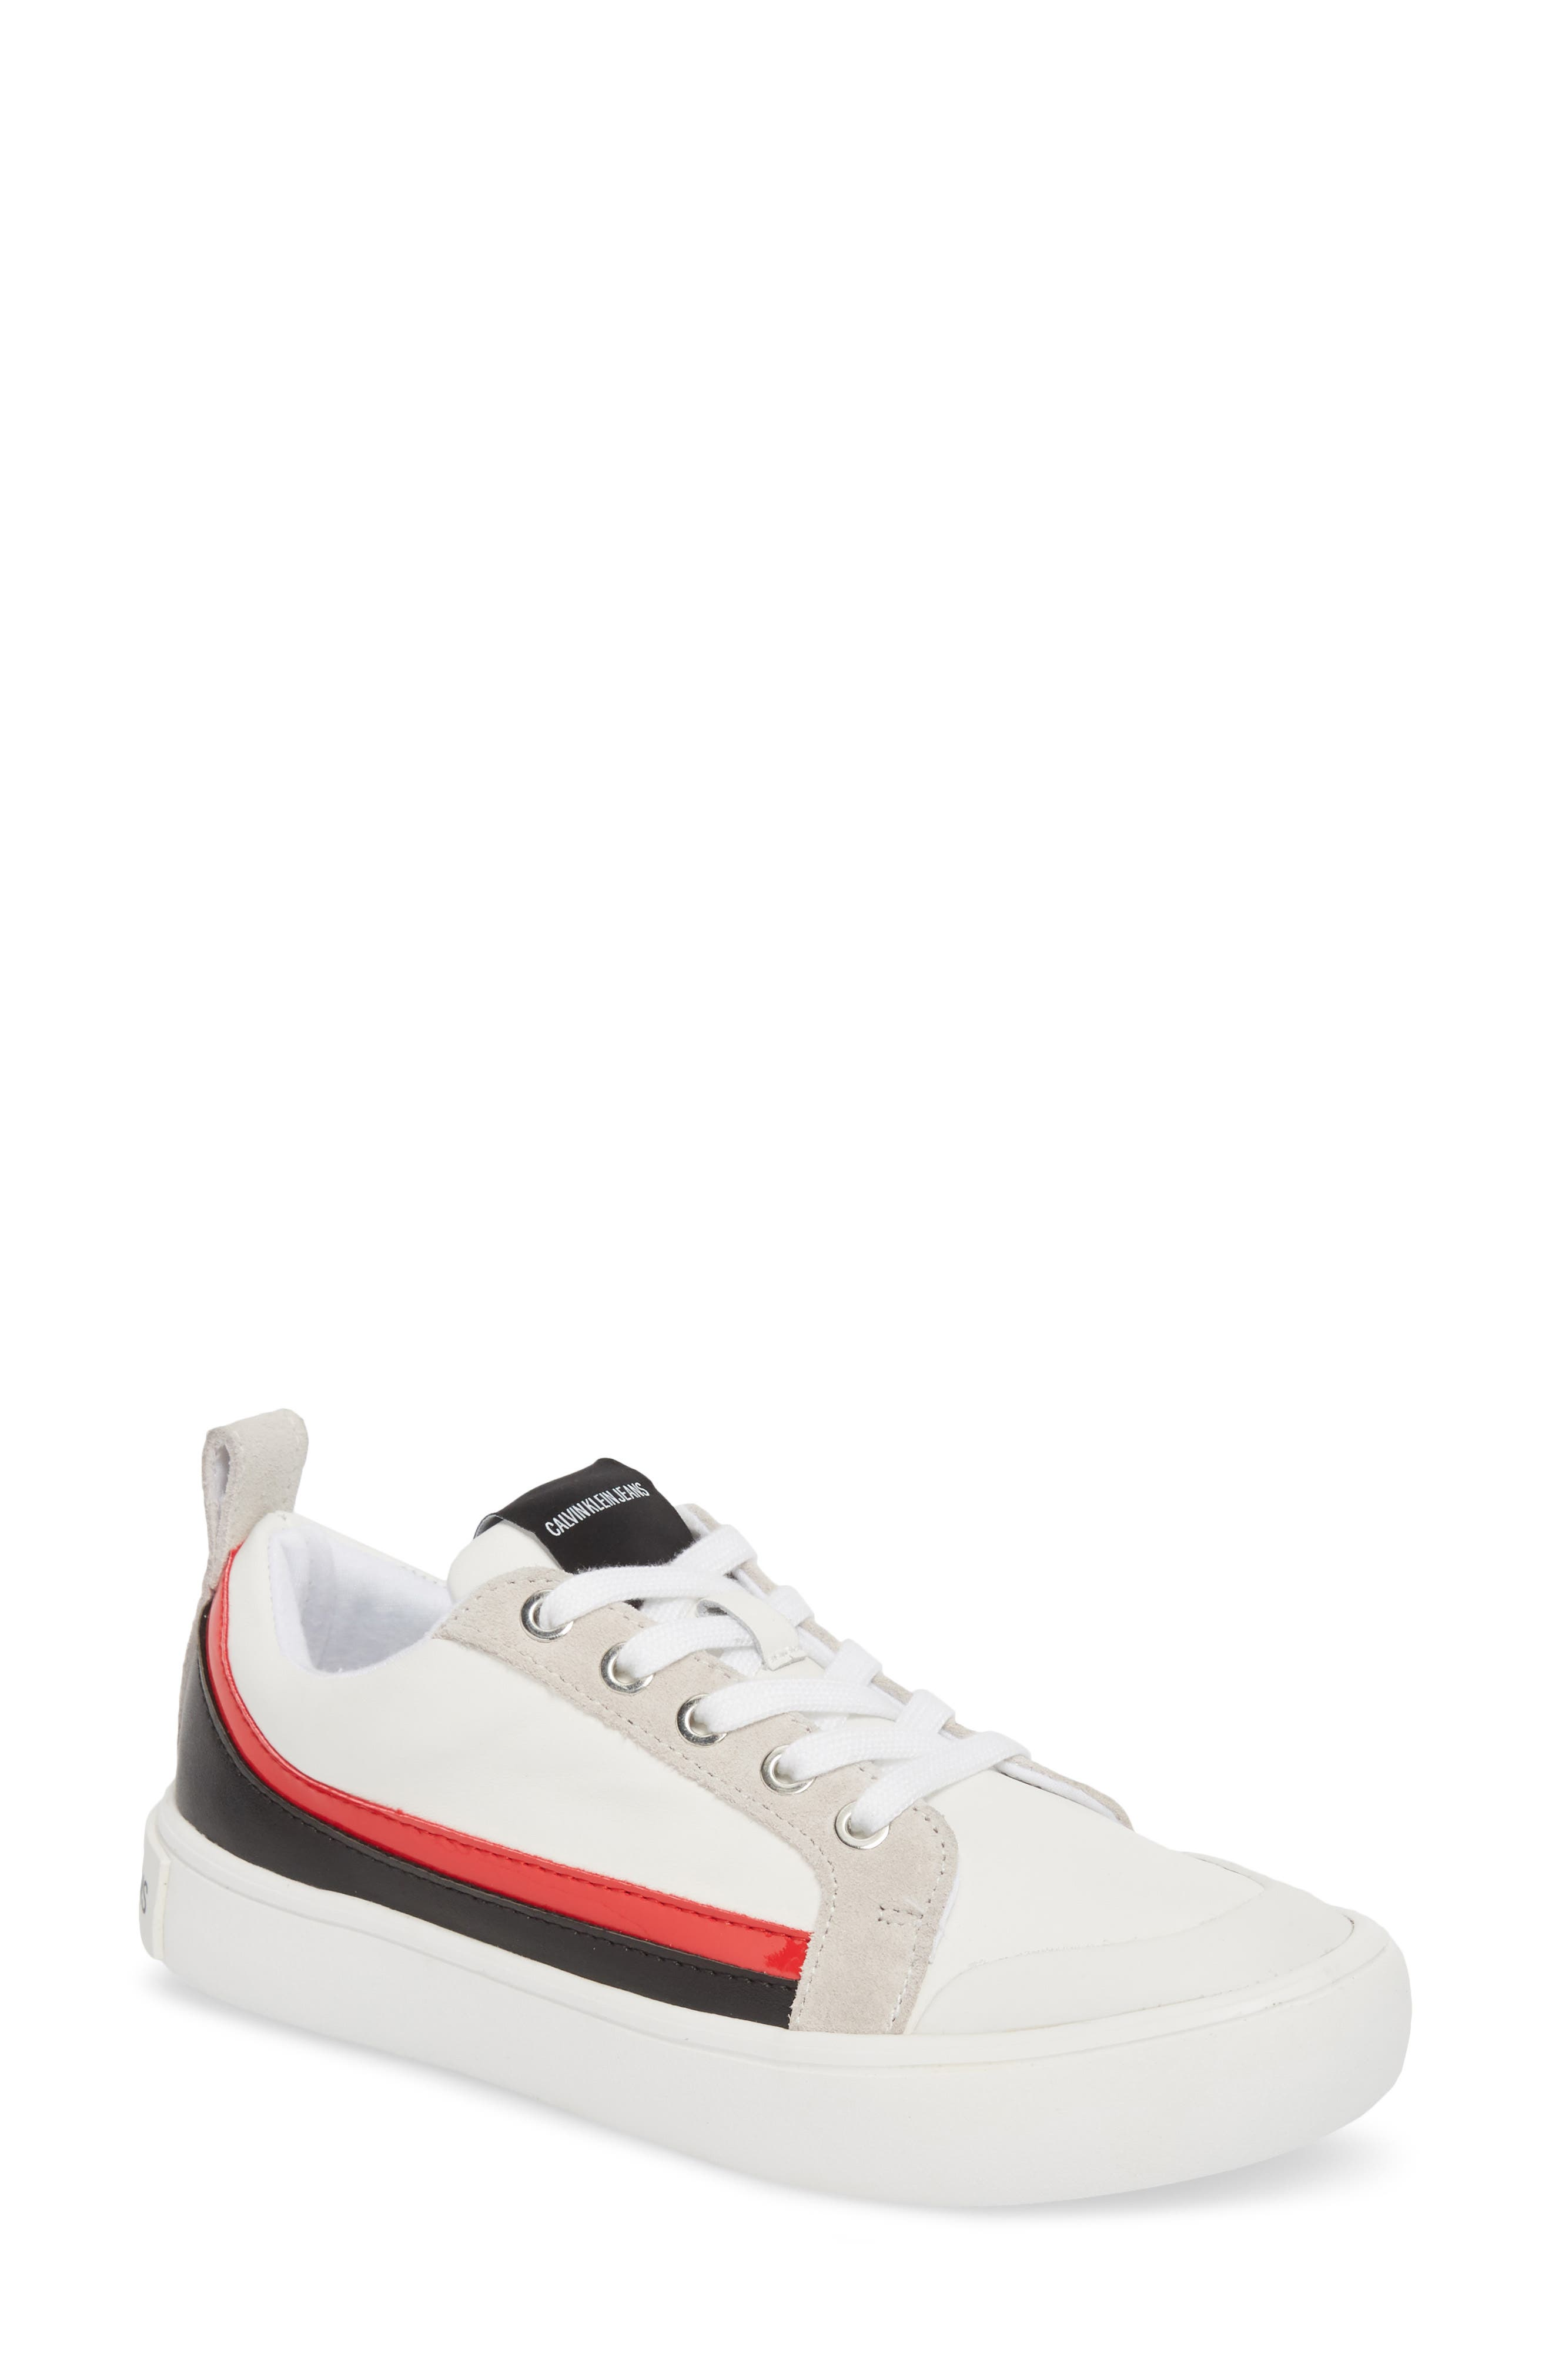 Dodie Sneaker, White/ Black/ Tomato